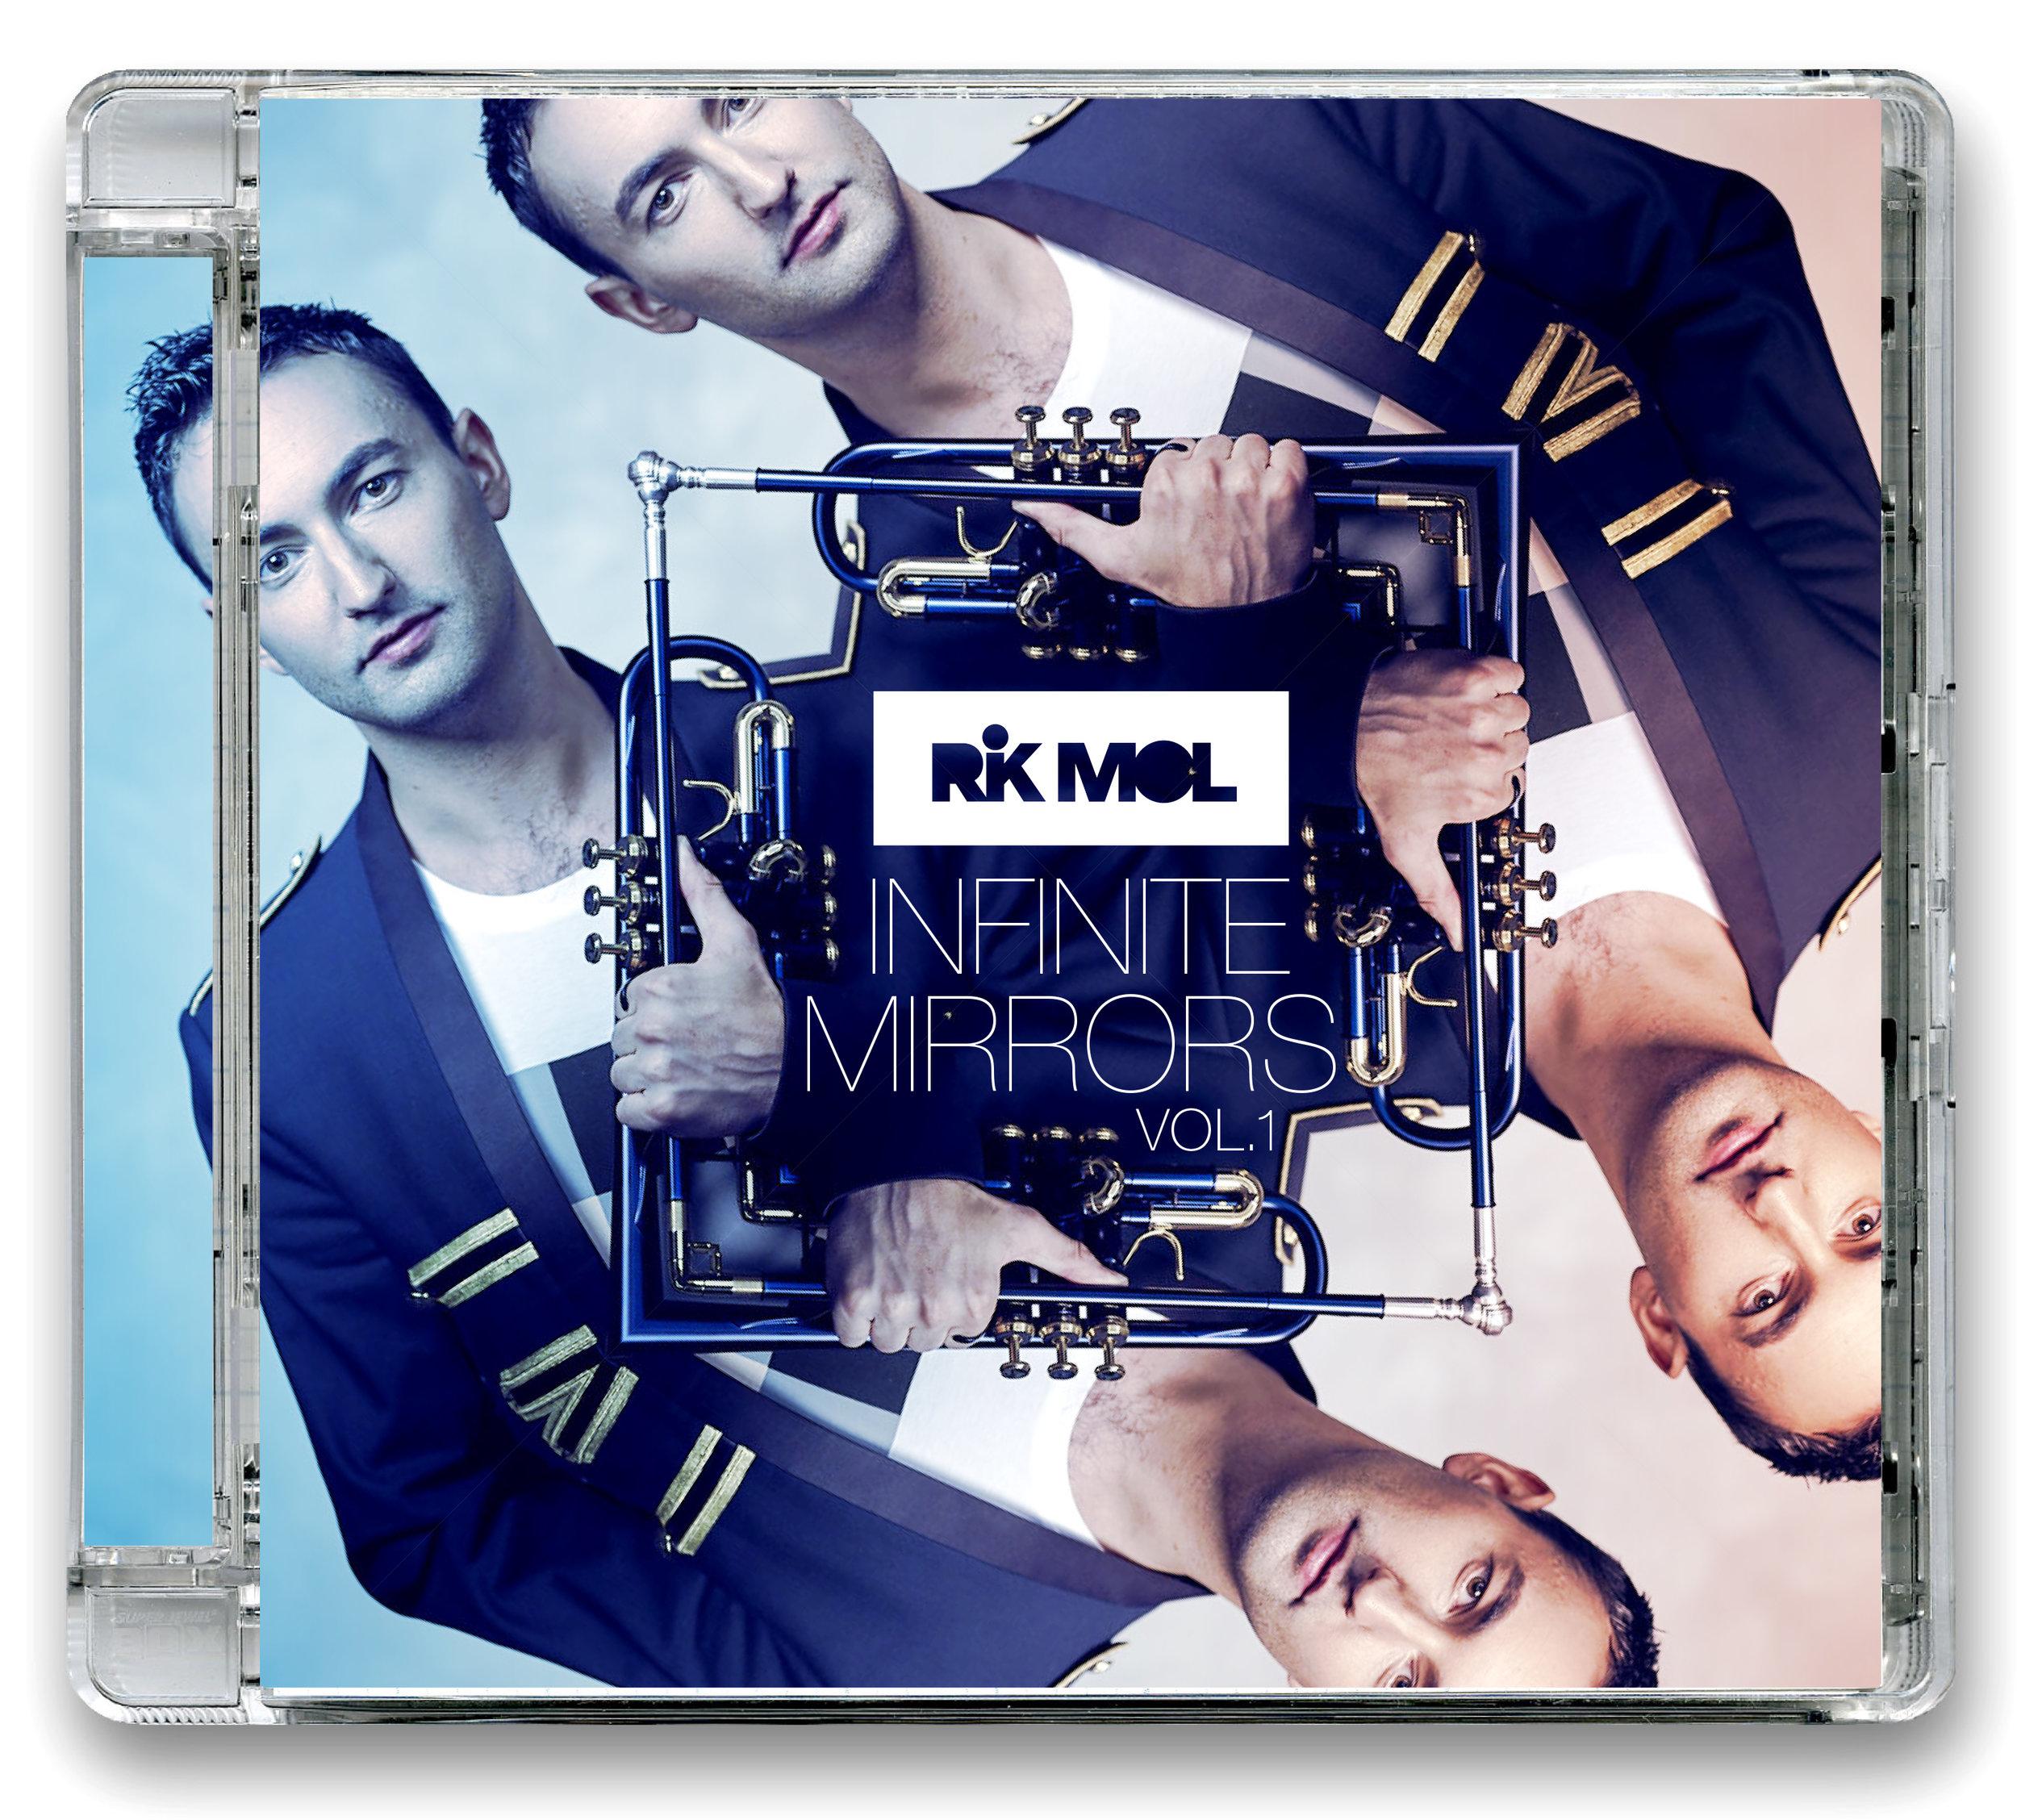 Rik Mol - Infinite Mirrors packshot.jpg